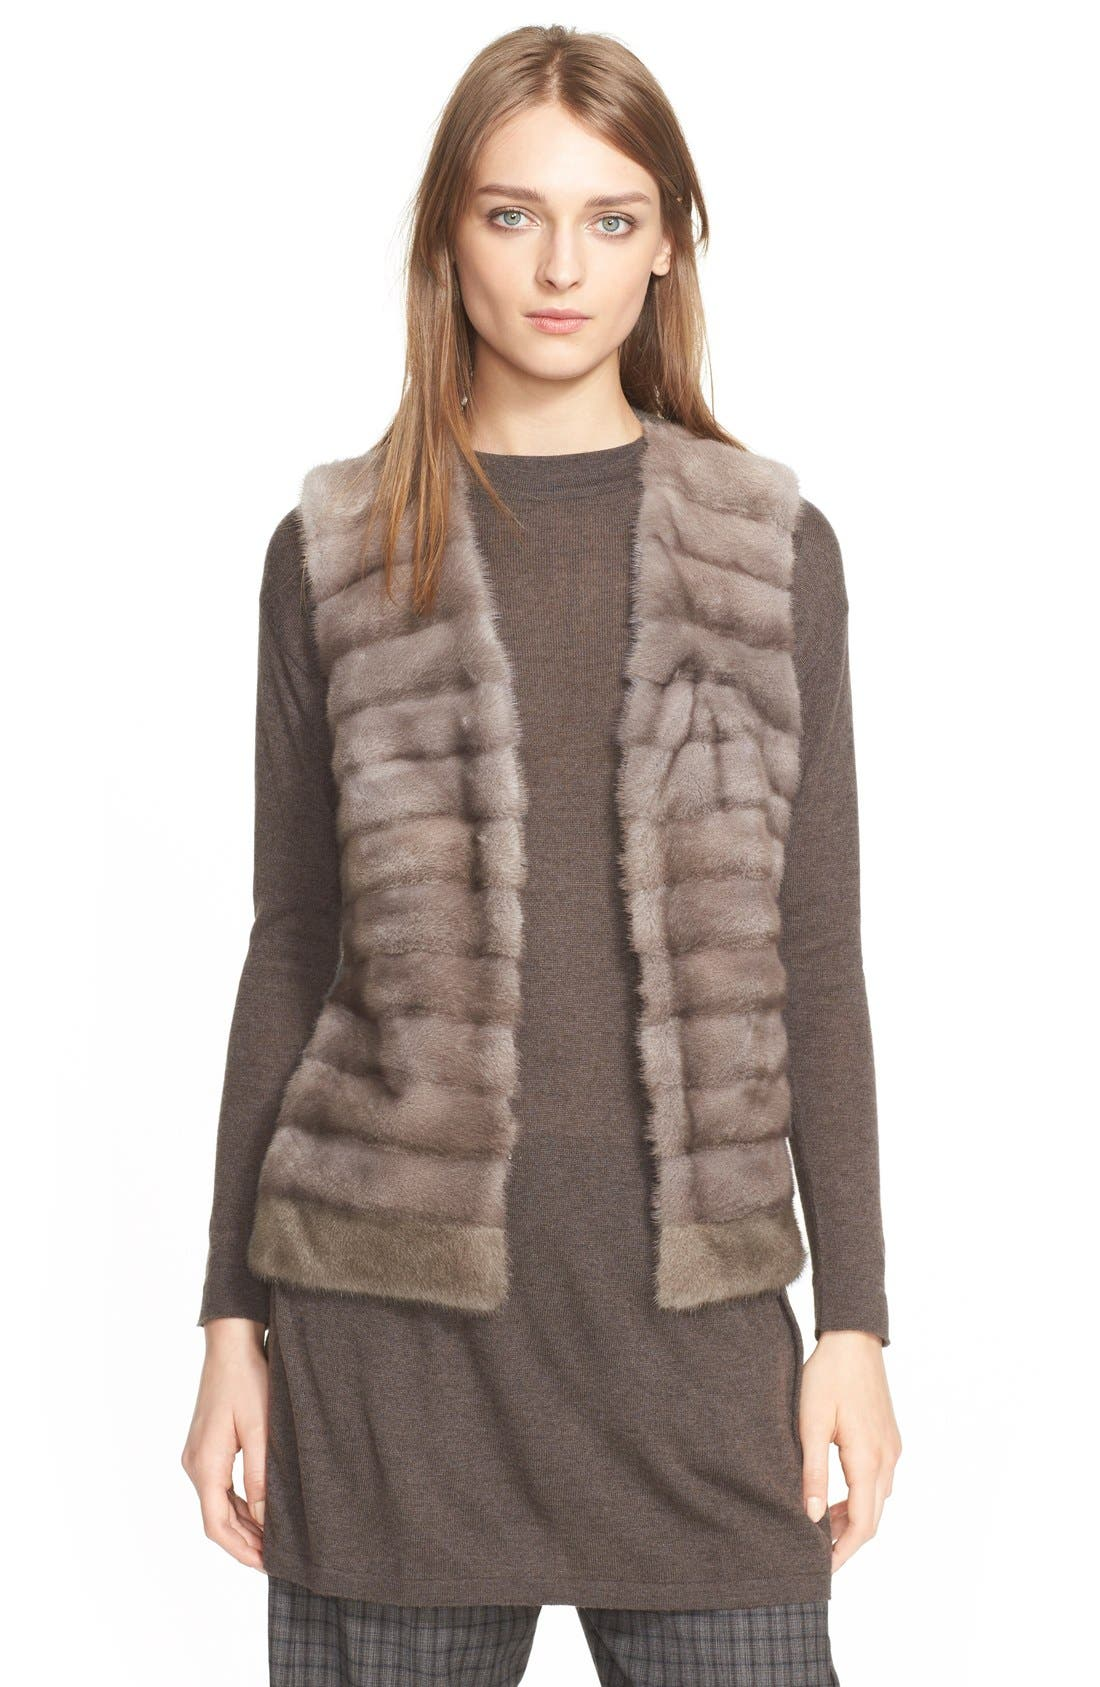 Genuine Mink Fur Vest with Cable Knit Back,                             Main thumbnail 1, color,                             078